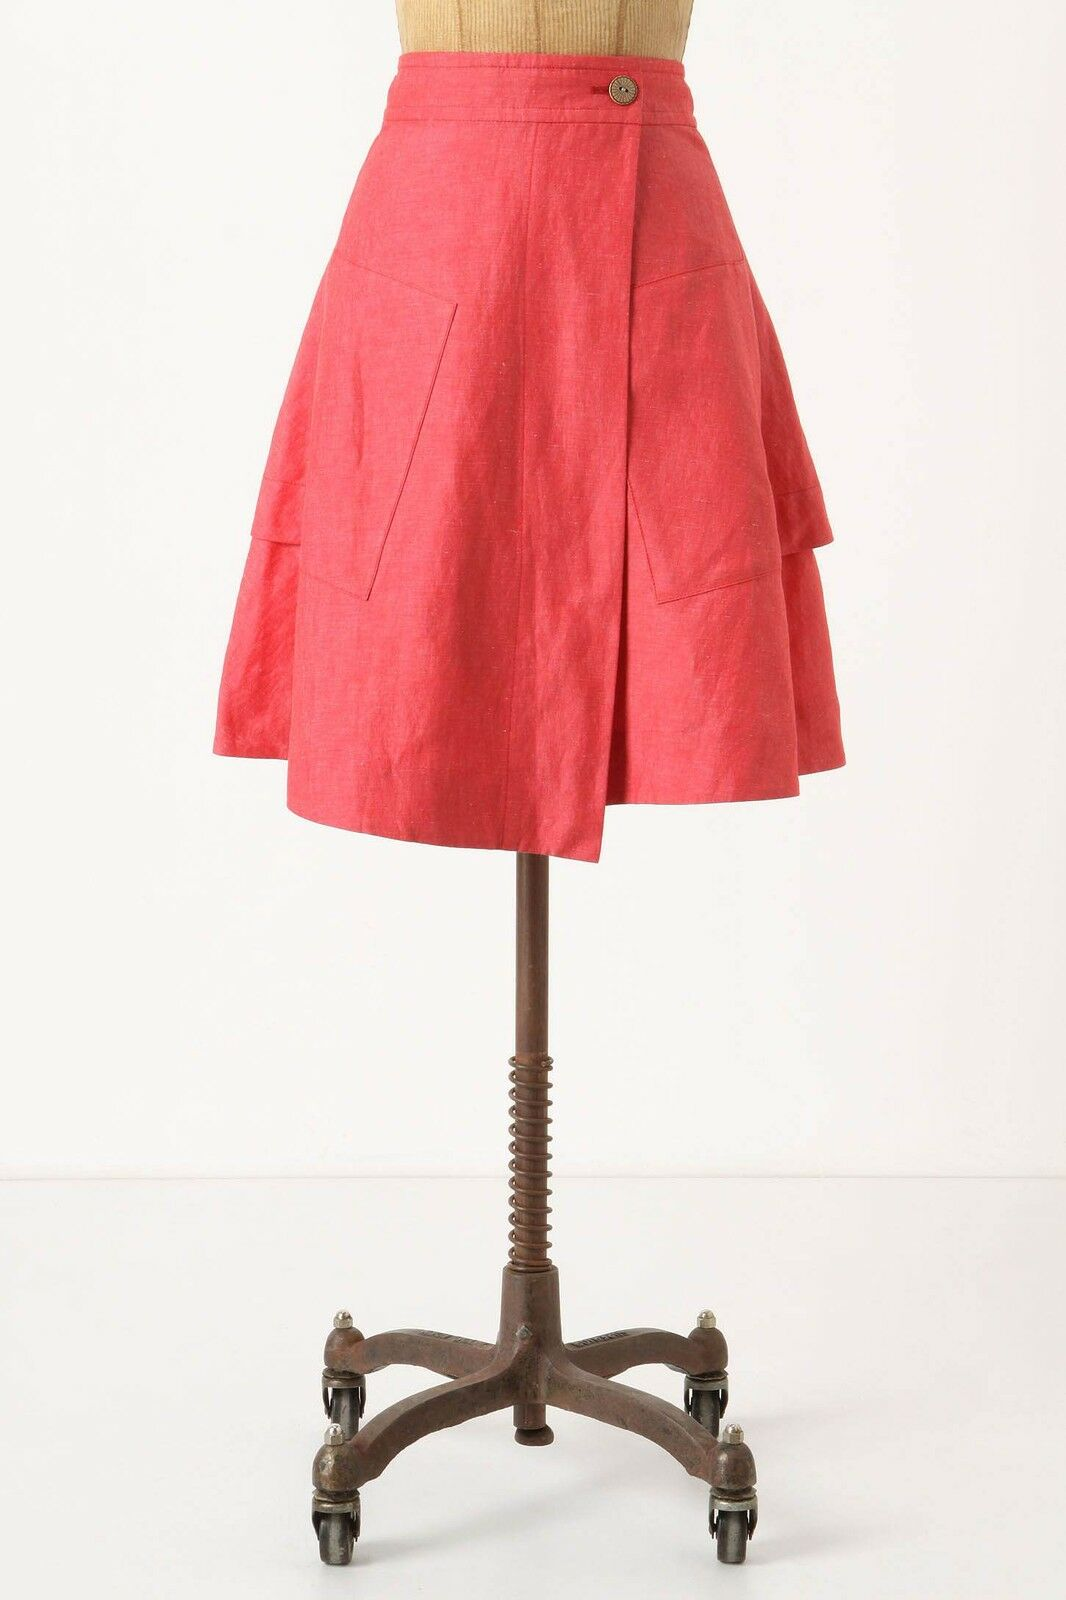 NIP Anthropologie Vast Wrap Skirt Pink Size 0